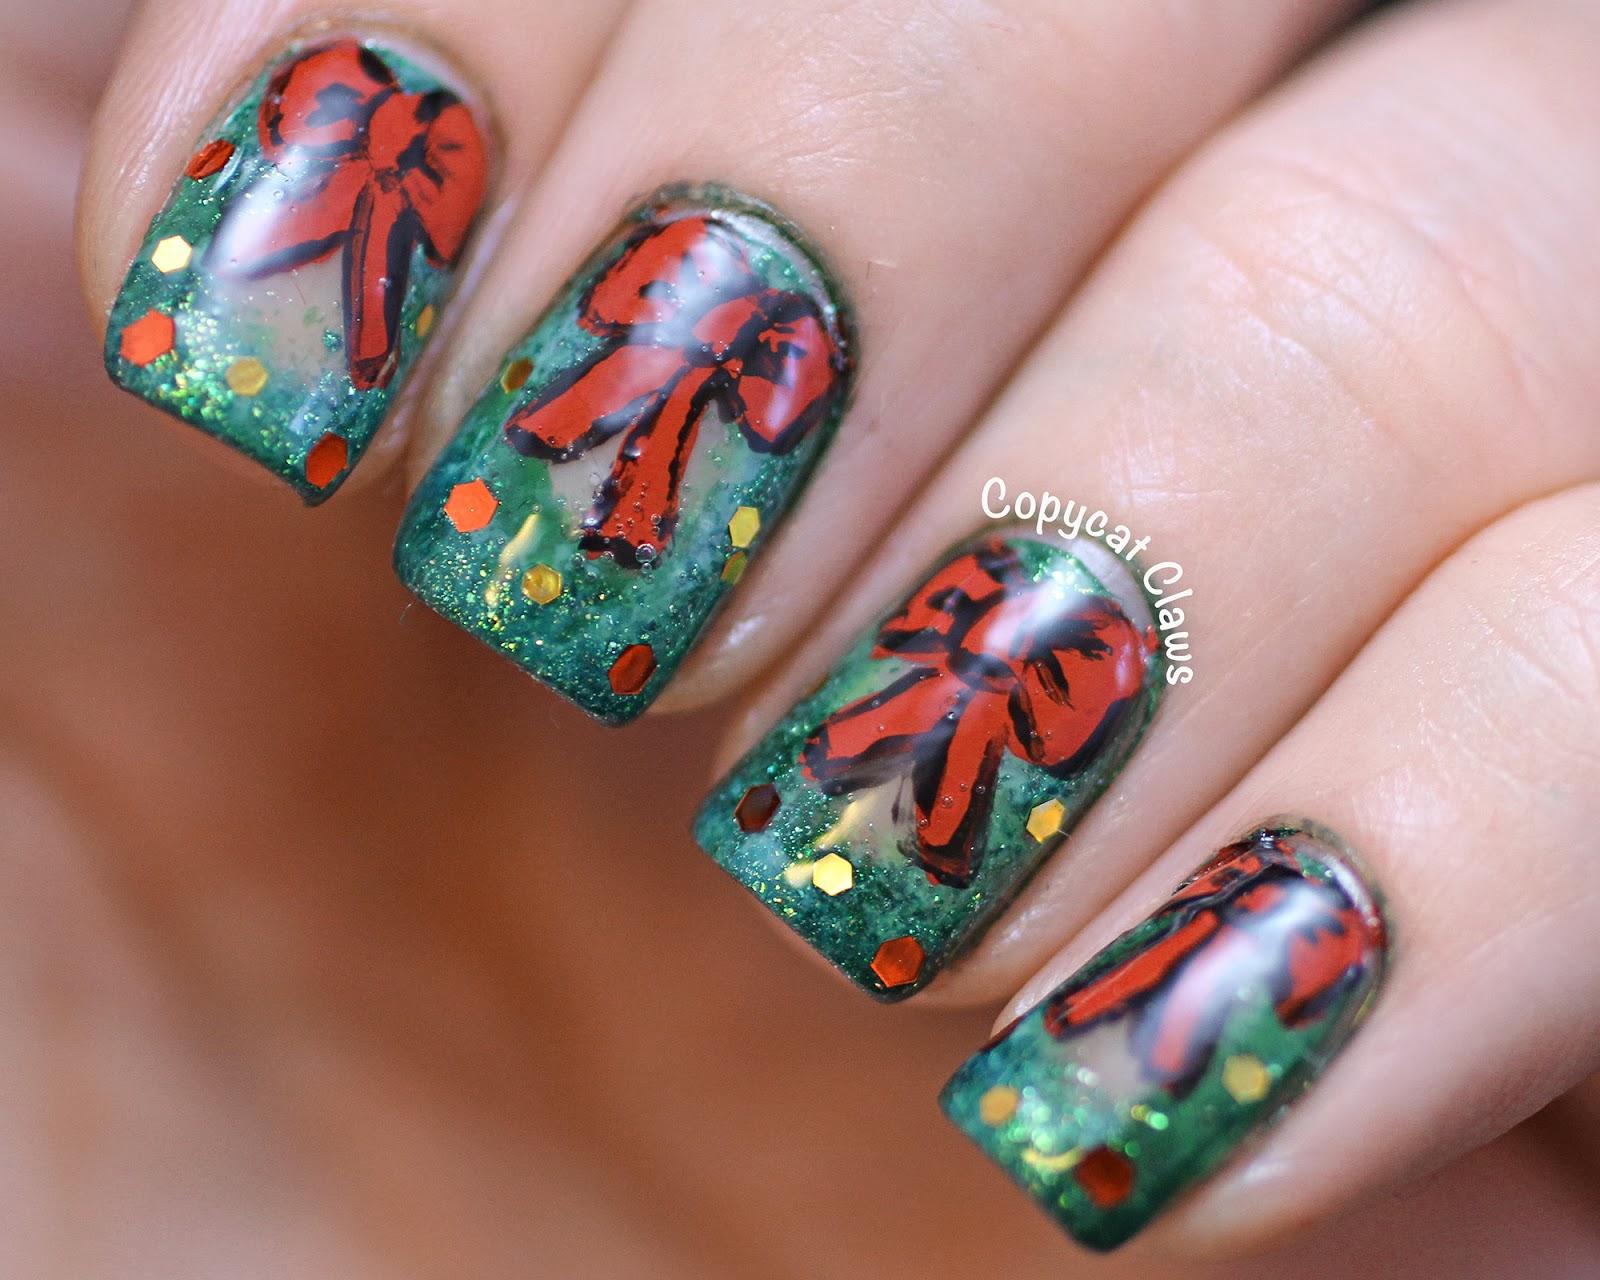 Copycat Claws: Holiday Wreath Nail Art